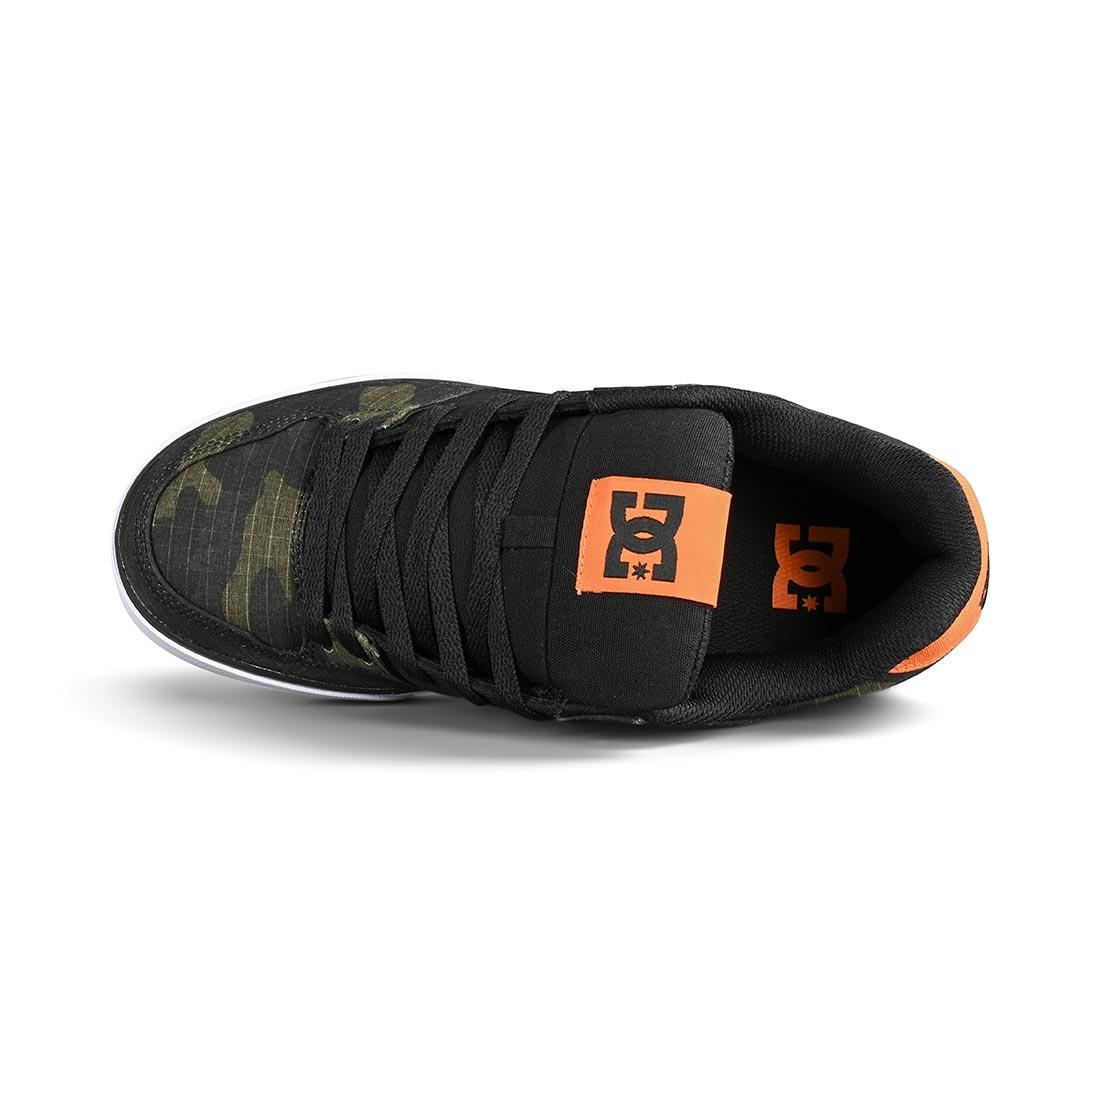 DC Shoes Pure TX SE - Camo | Supereight.net